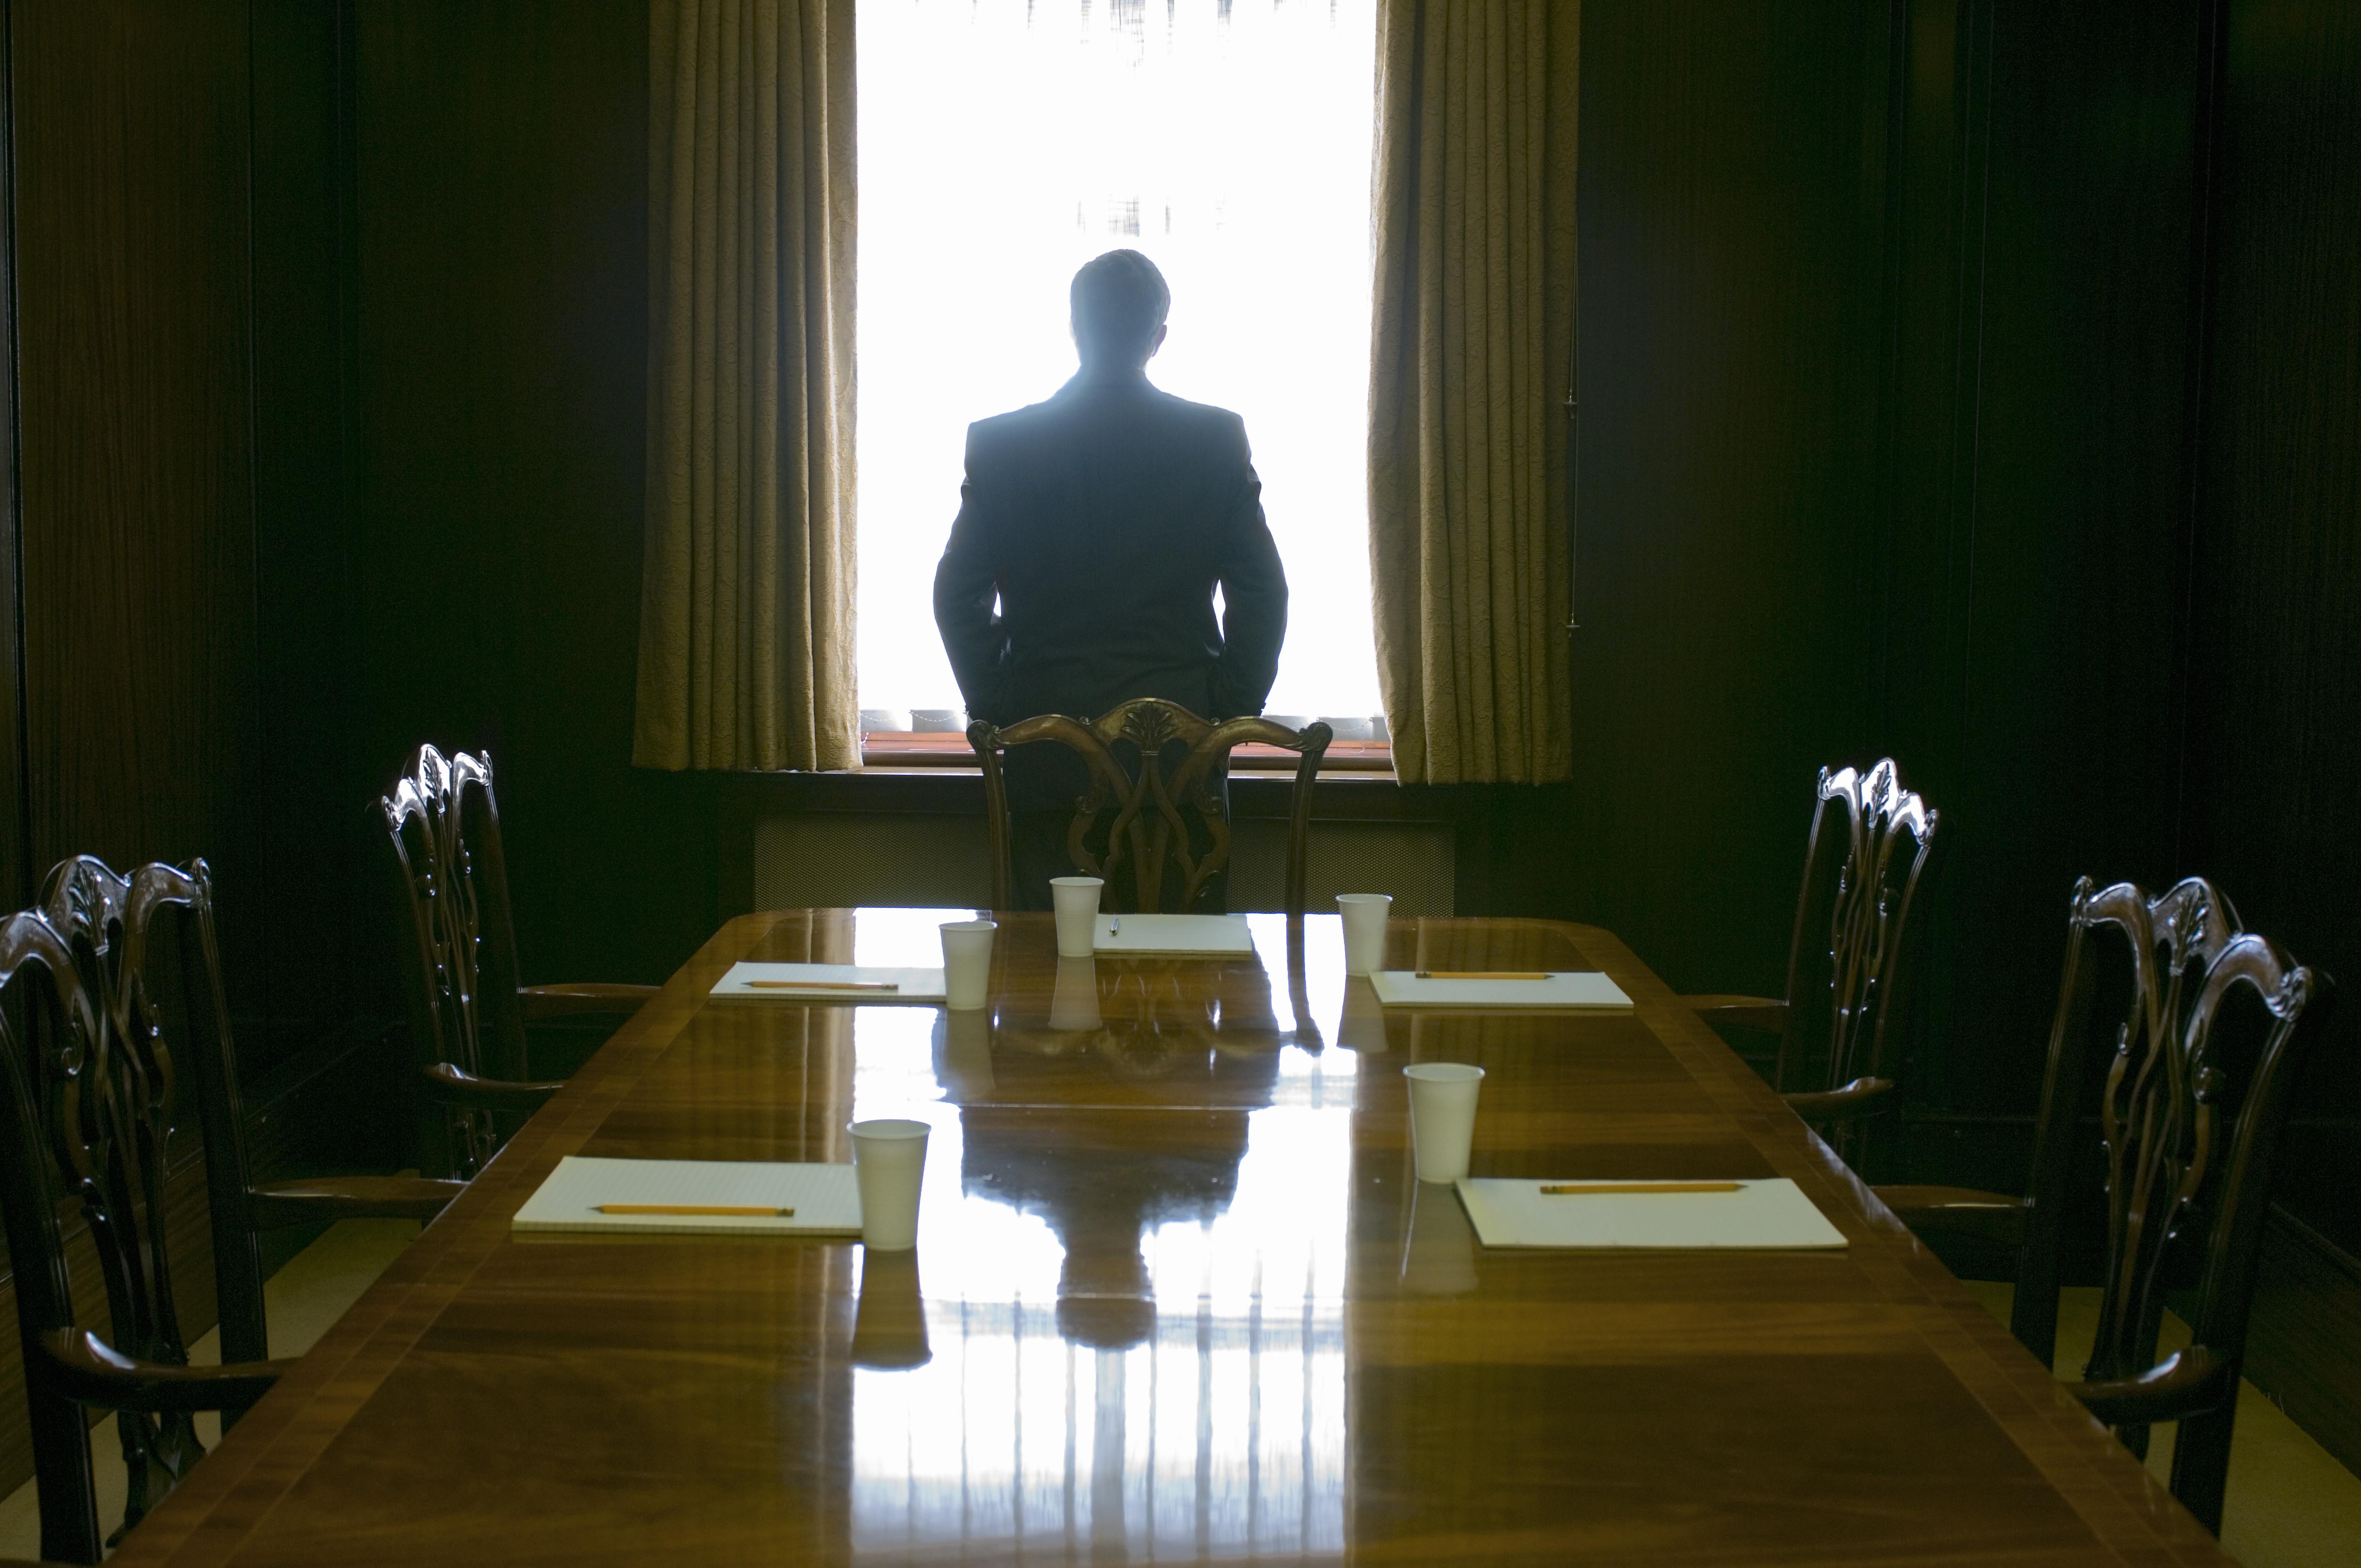 Businessman facing window in meeting room, rear view